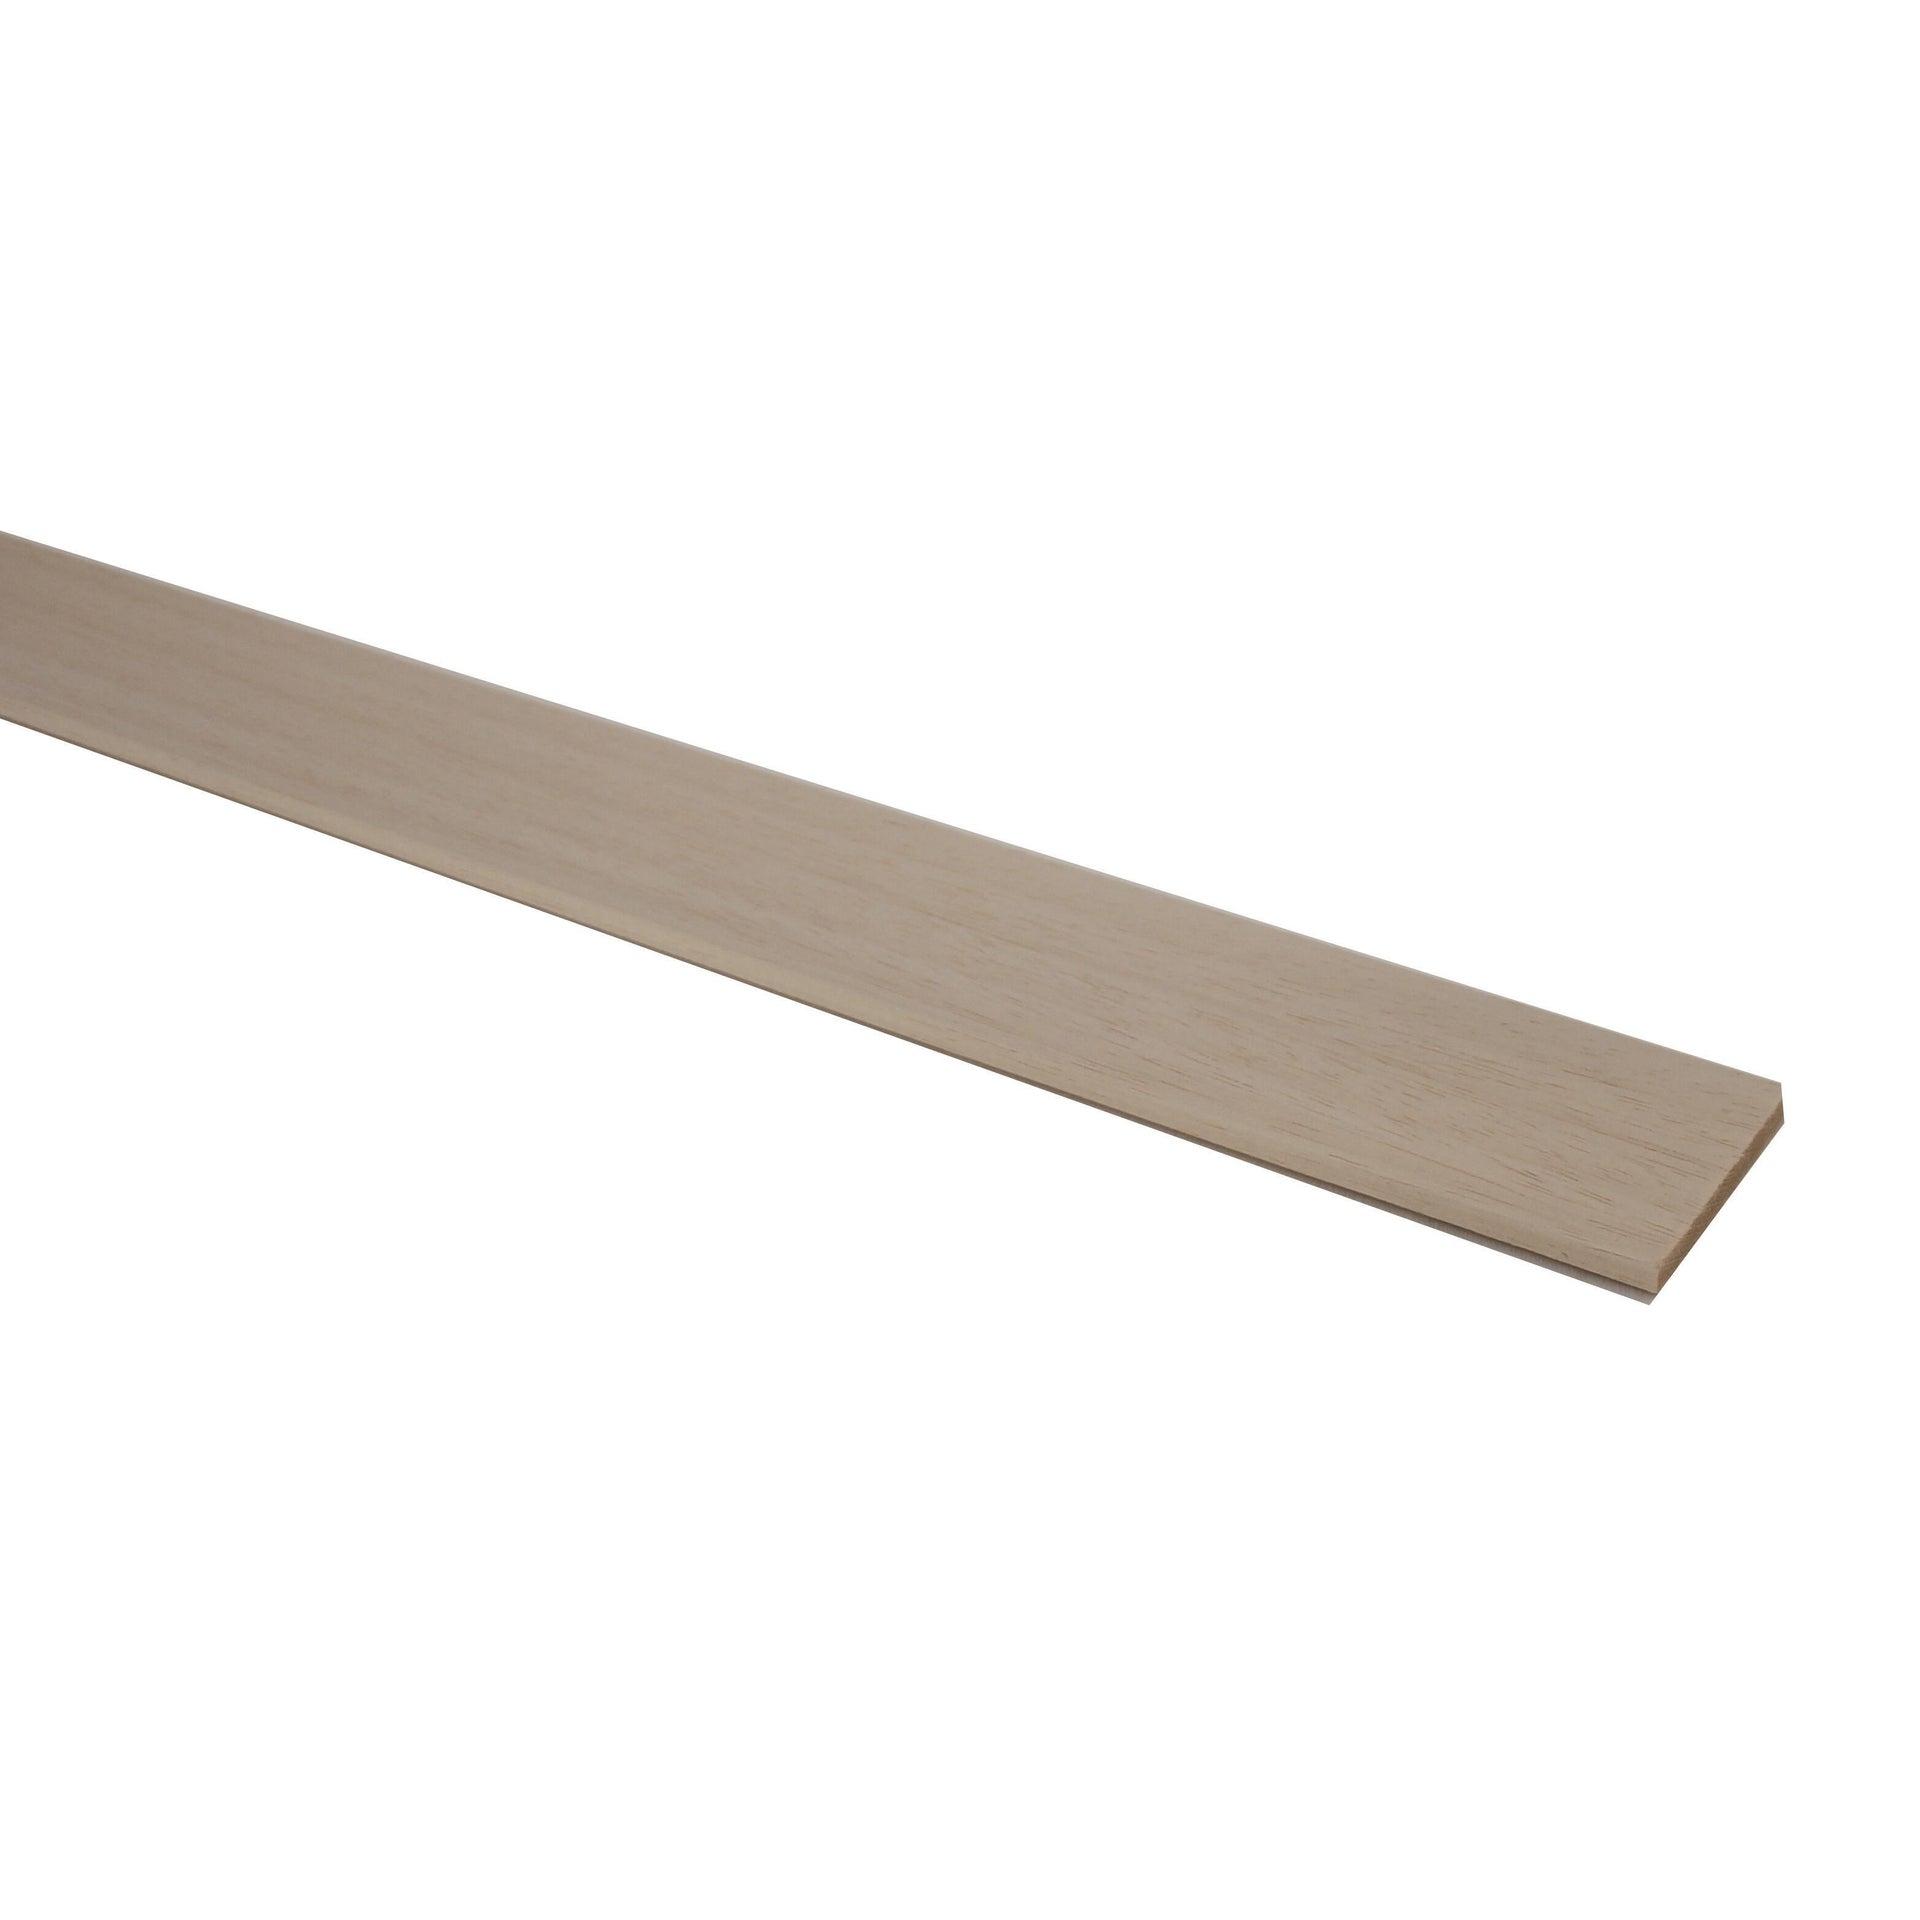 Listello piallato ayous 1 m x 50 mm, Sp 5 mm